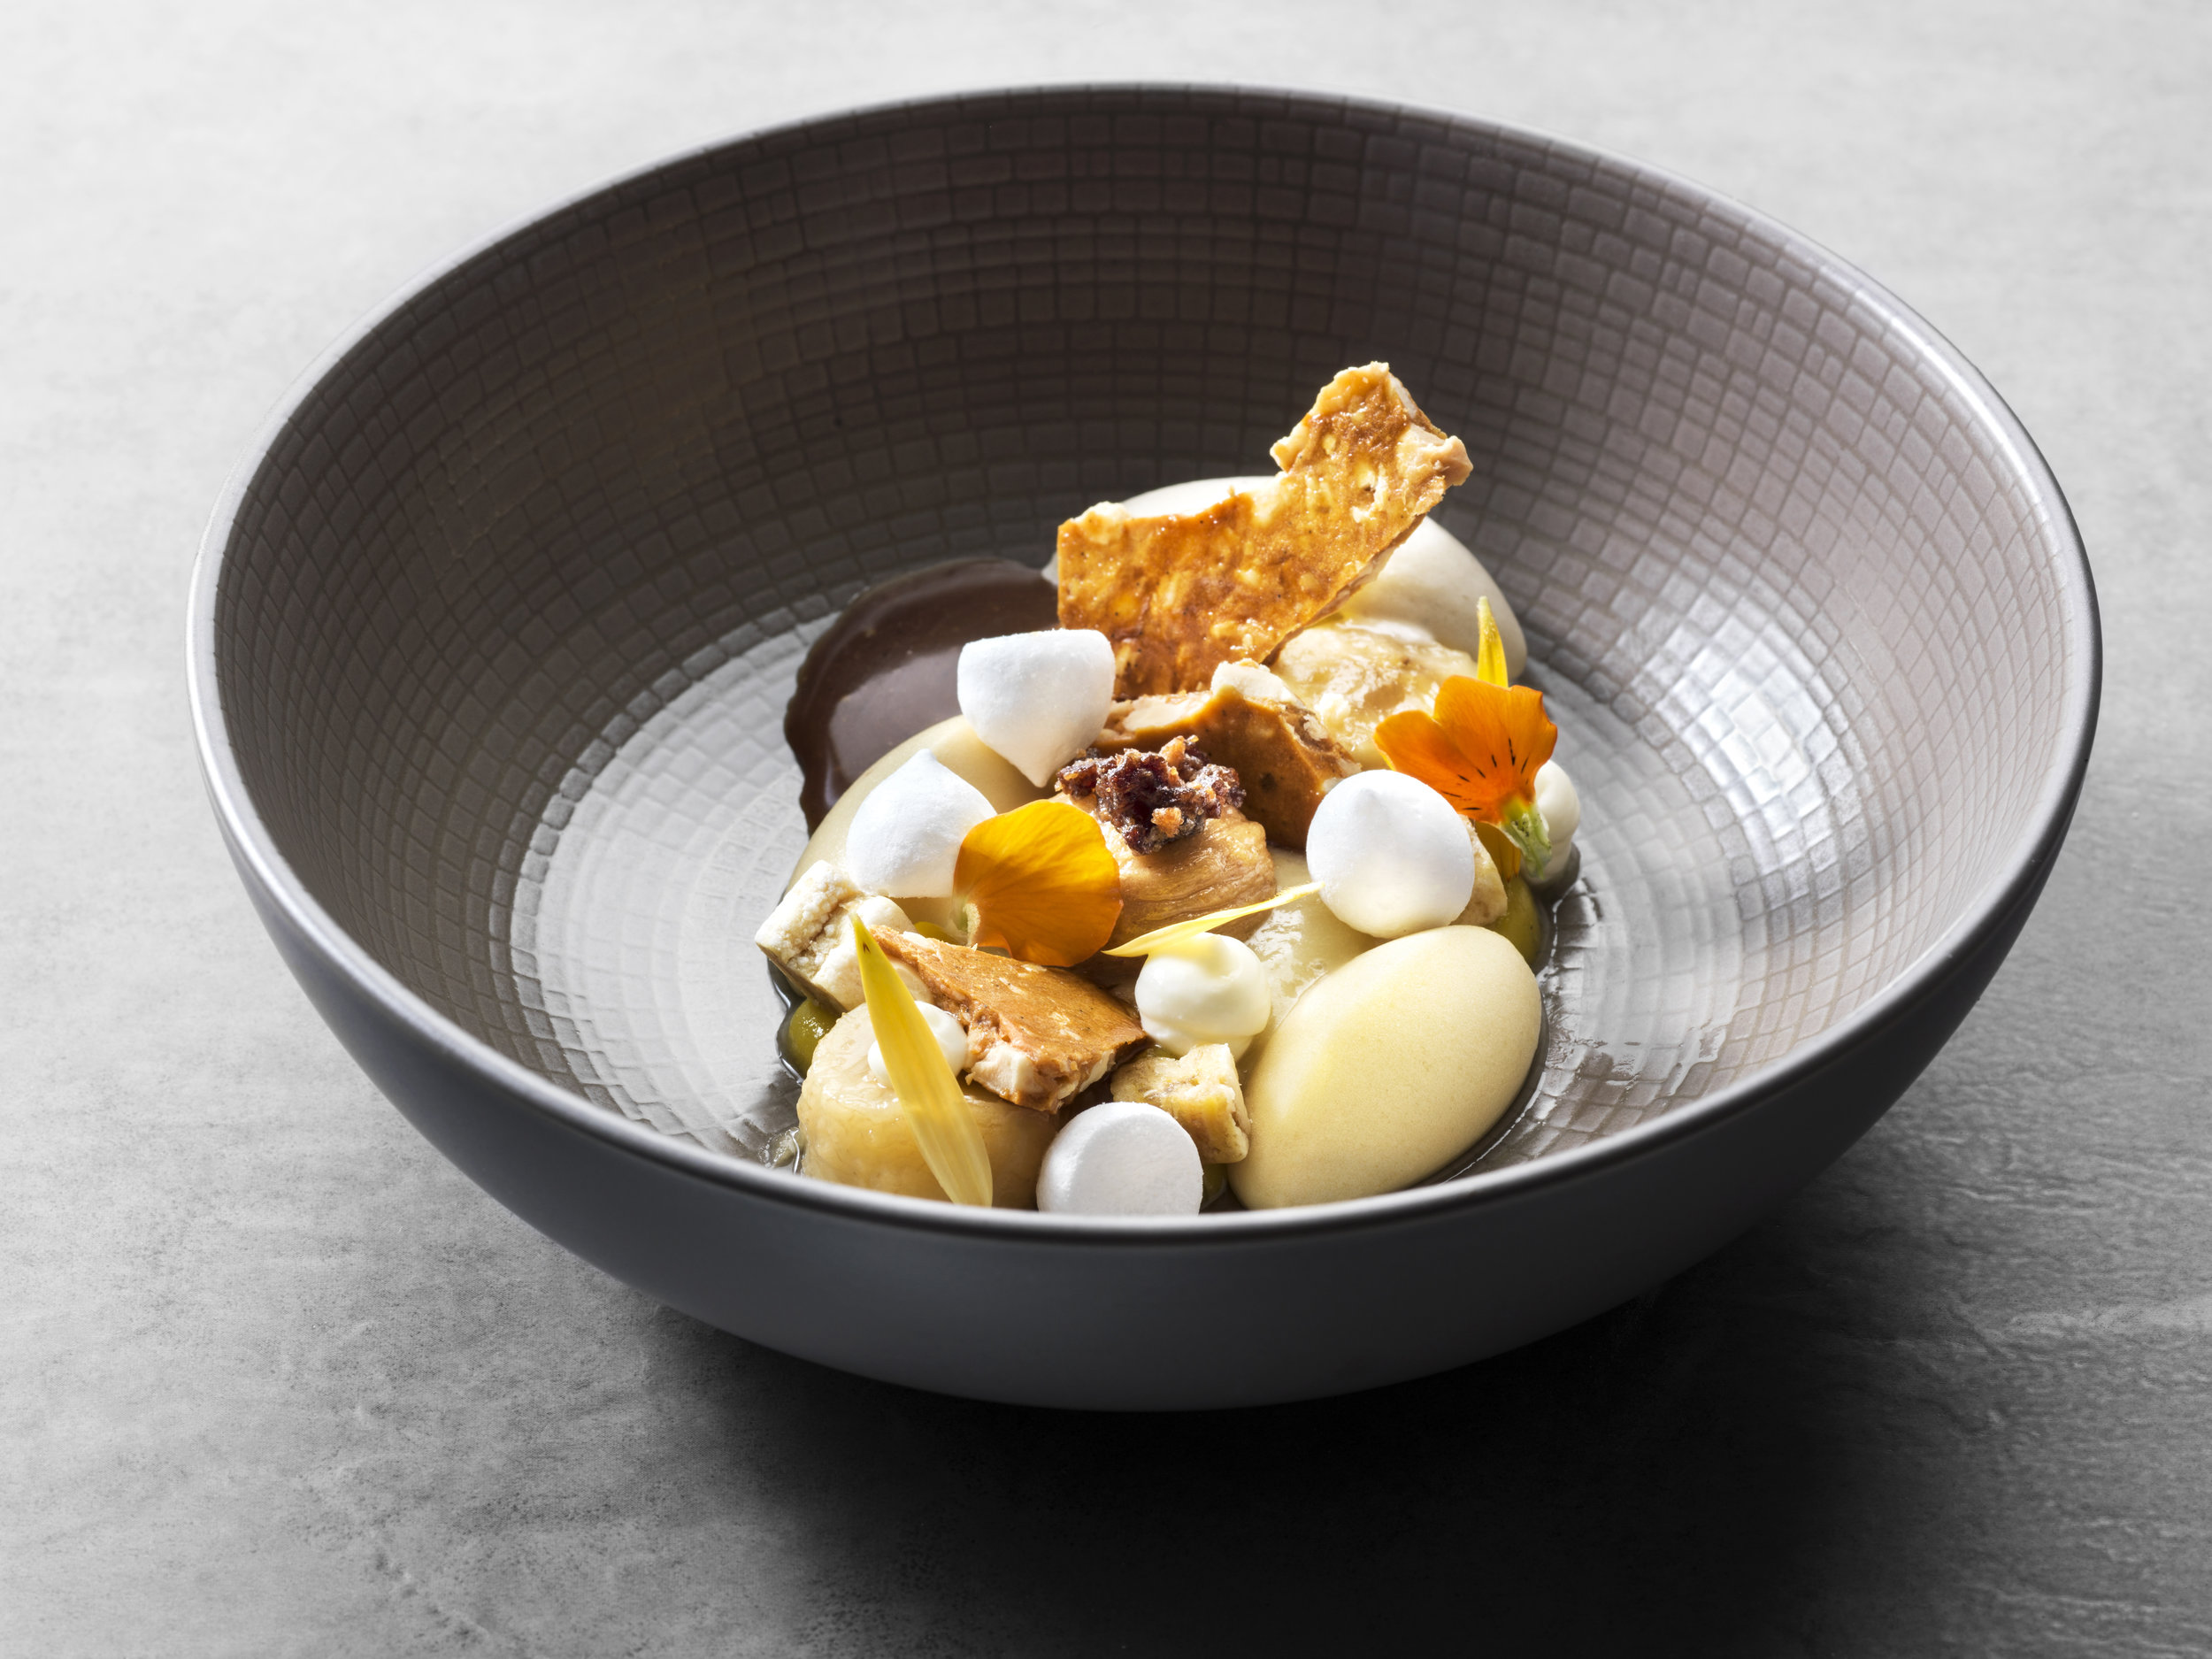 Marcel van Lier | Banaan, spek, pinda en karamel